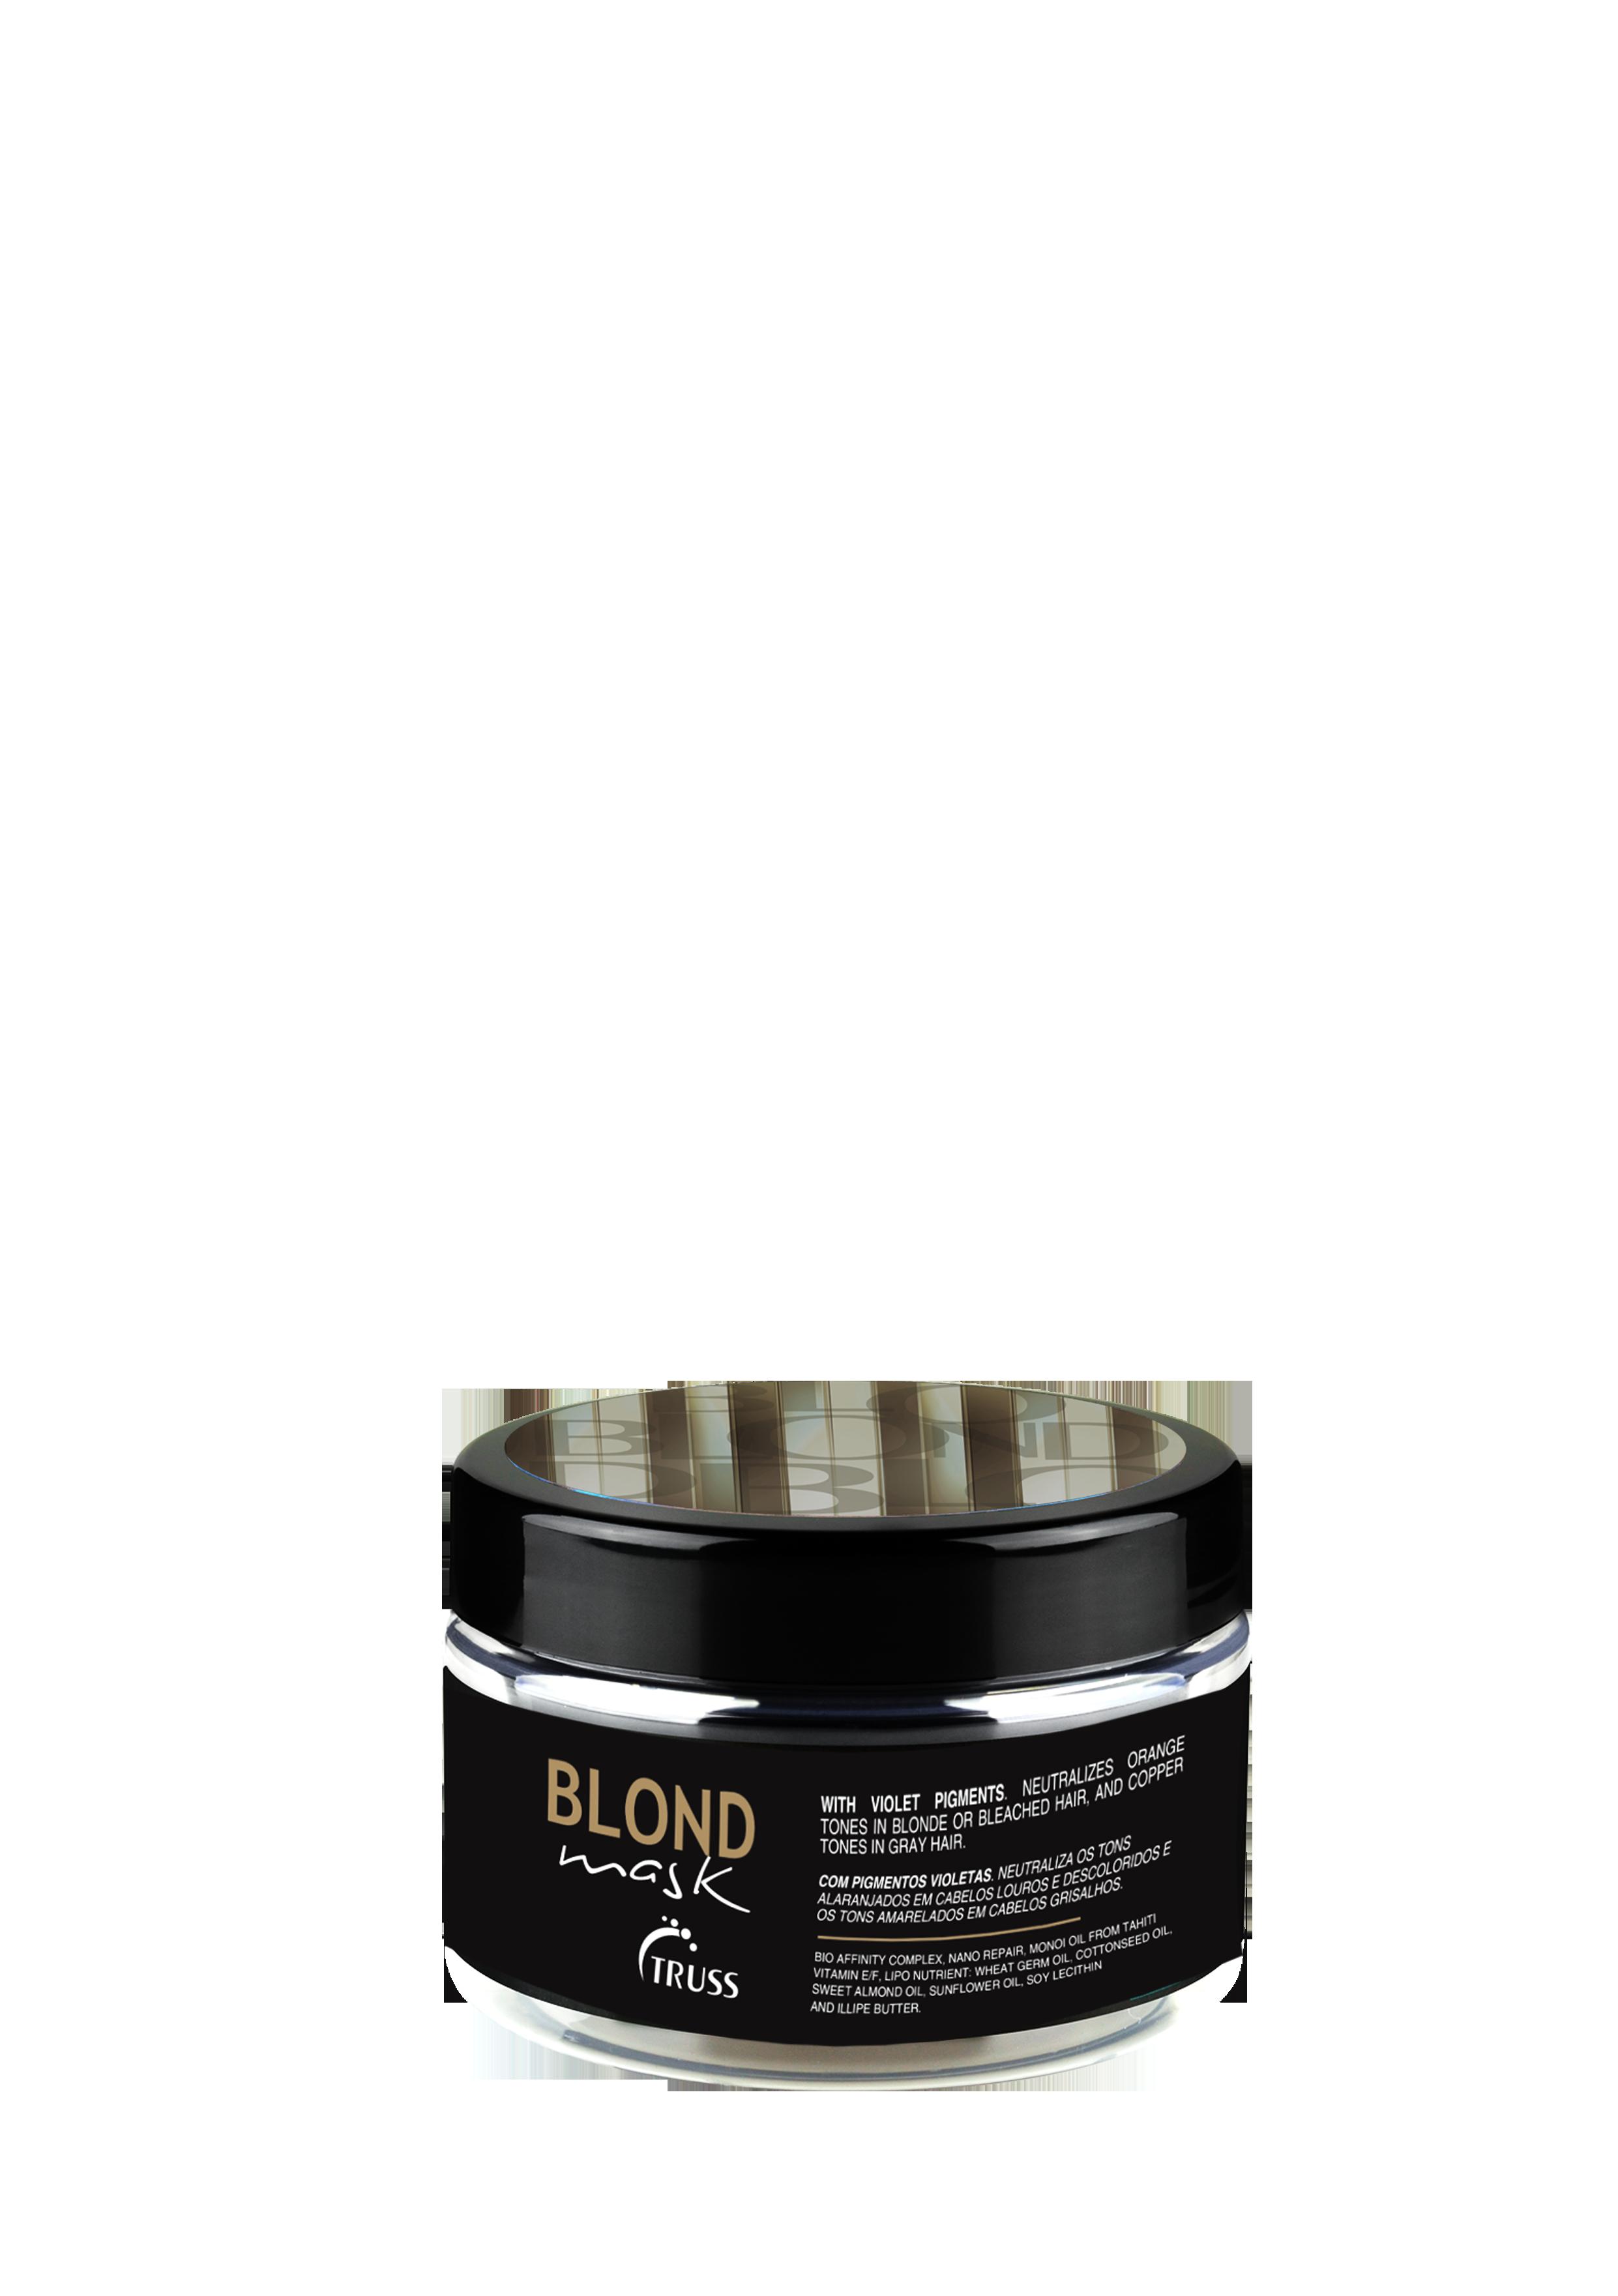 Blond Mask